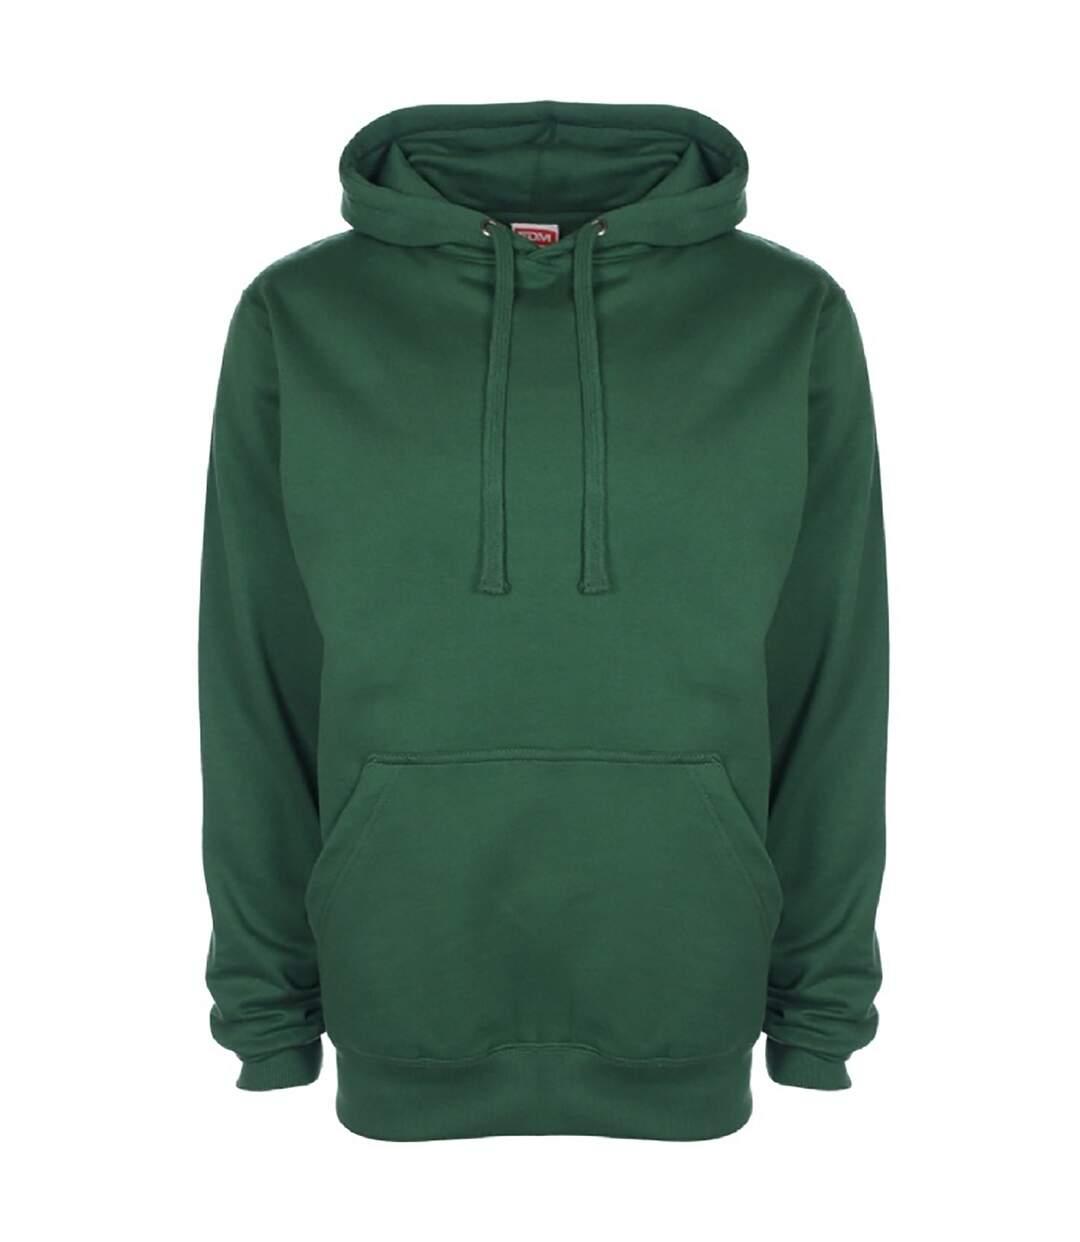 FDM Unisex Plain Original Hooded Sweatshirt / Hoodie (300 GSM) (Forest Green) - UTBC2024